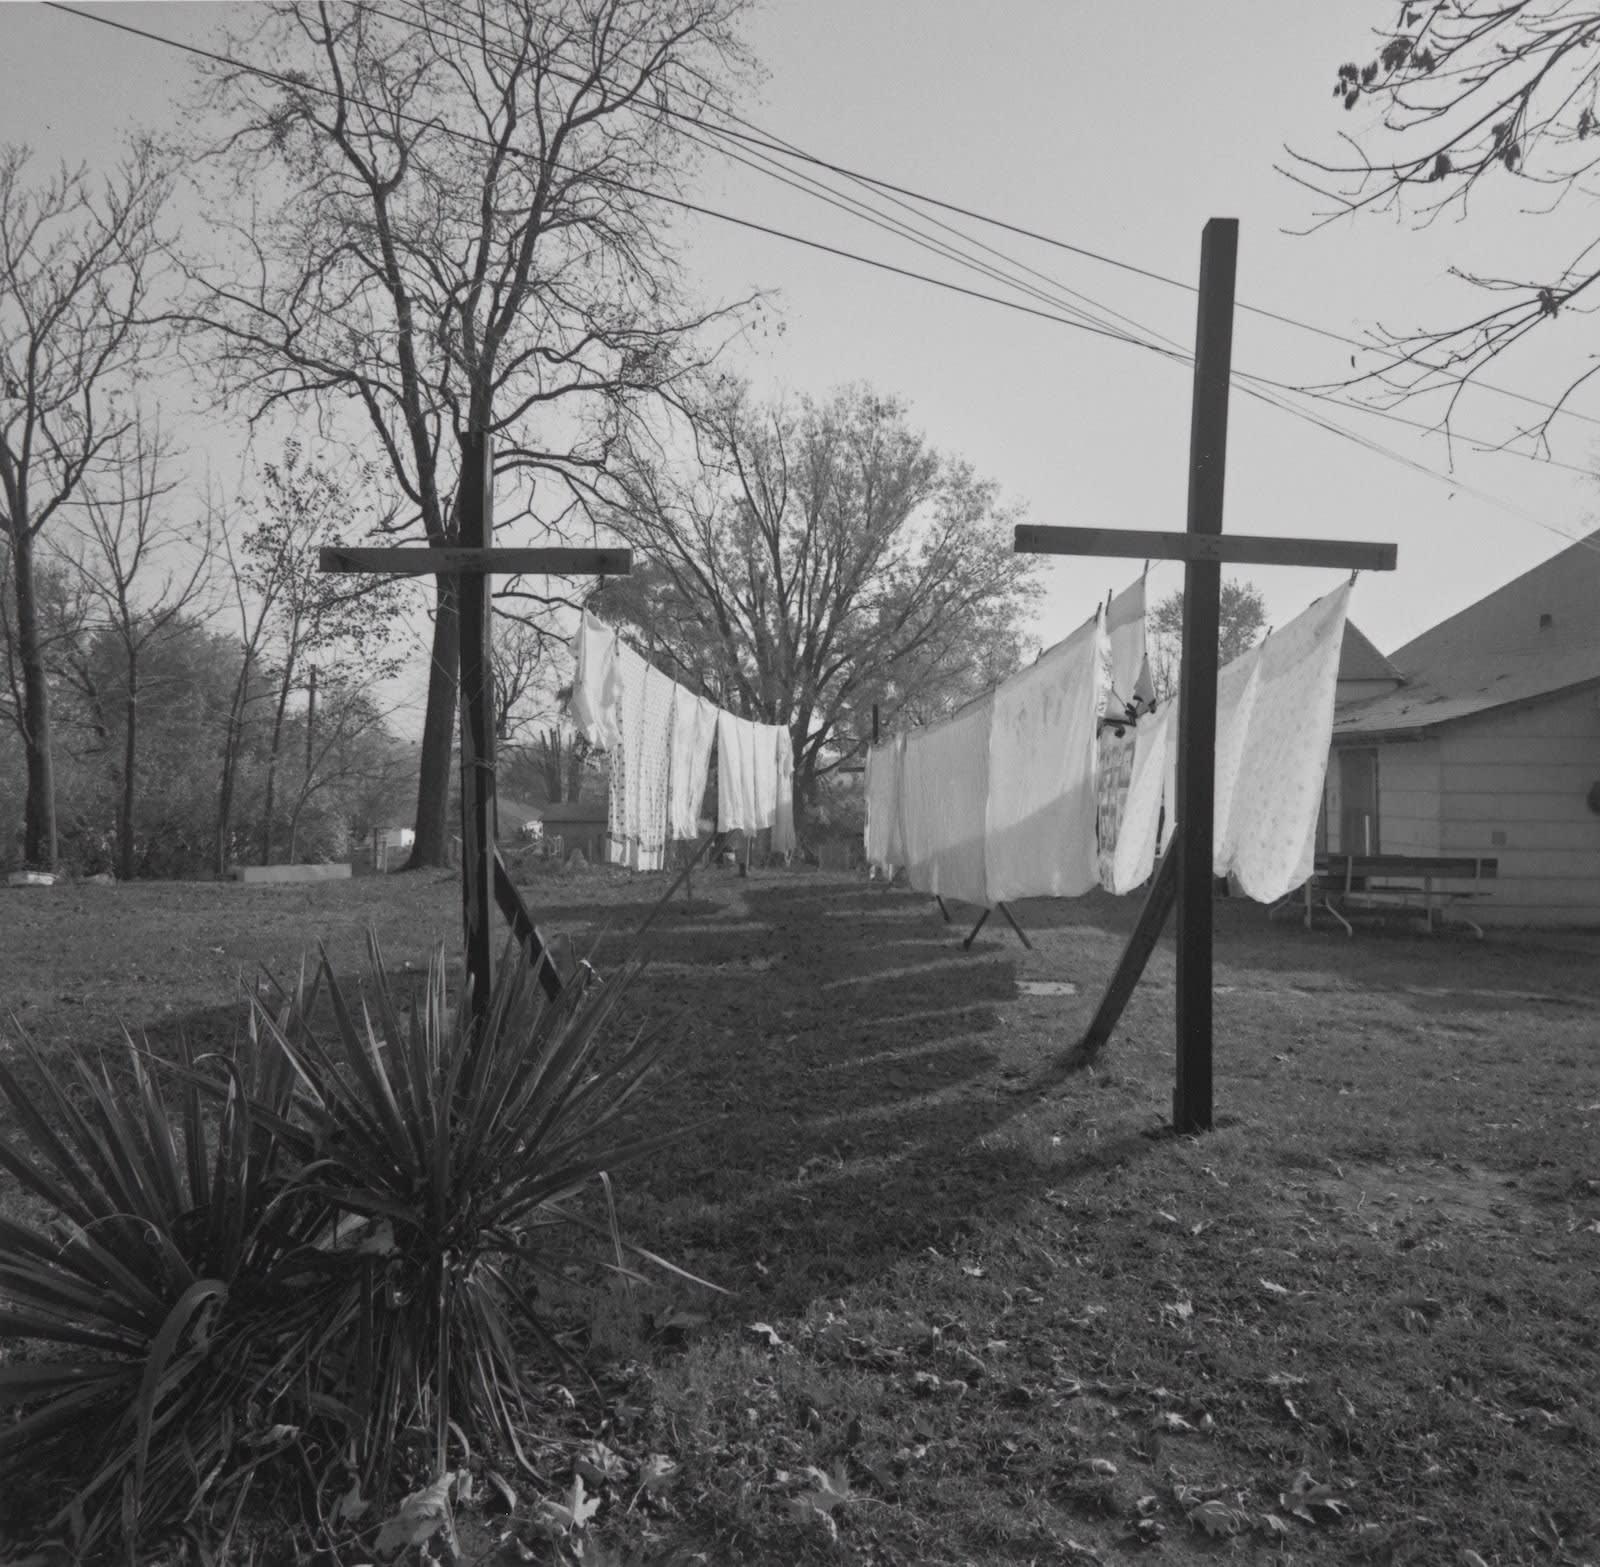 Steven Rifkin, Untitled, Bloomington, IN, 1977